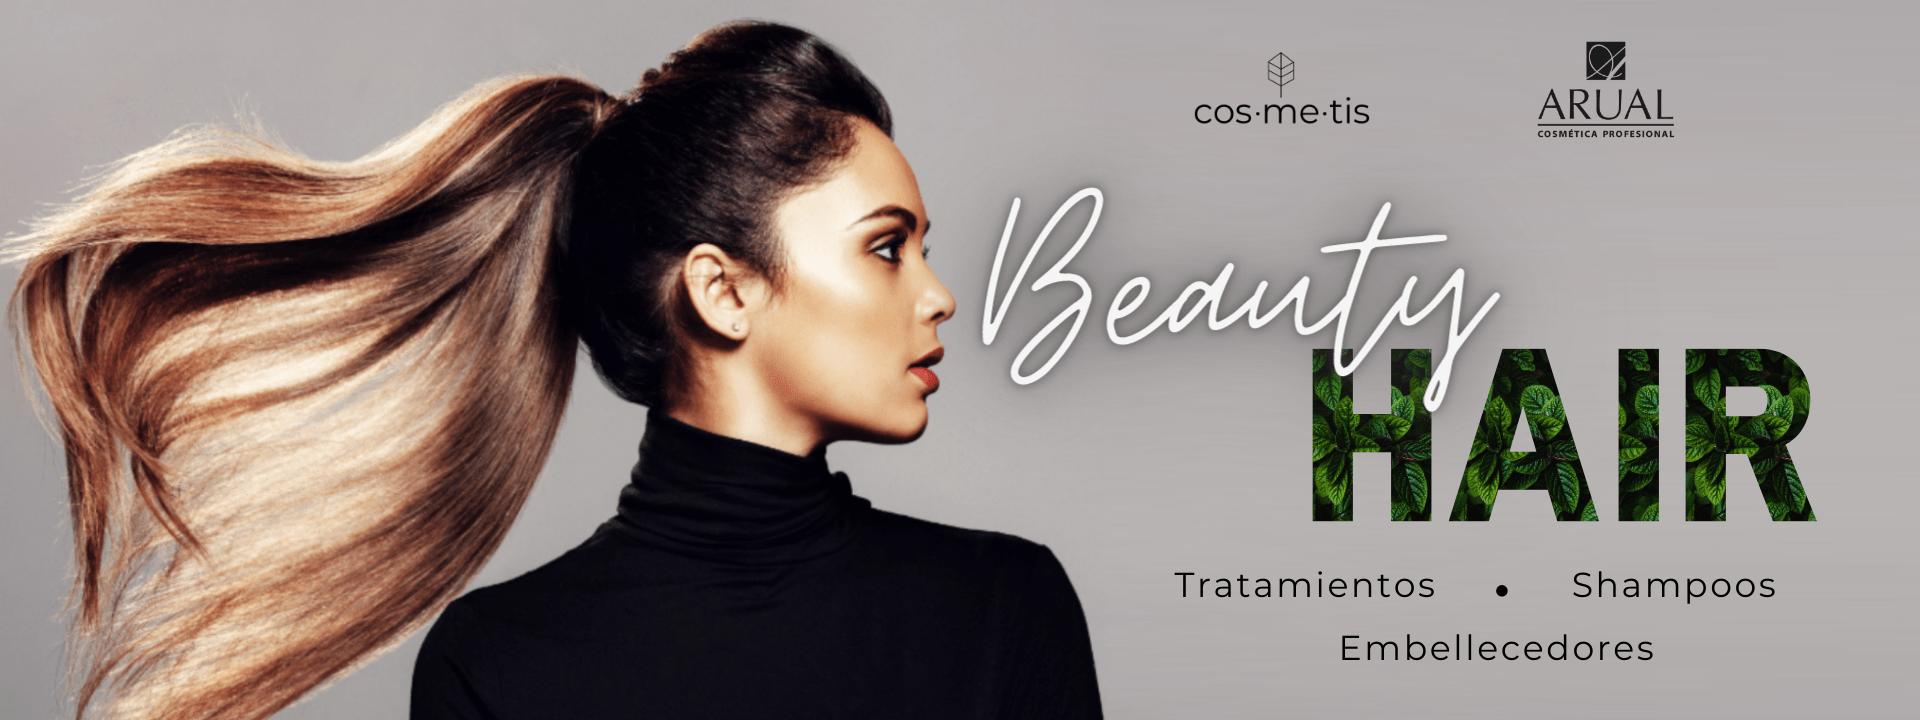 BANNER ARUAL- cosmetis.com.mx